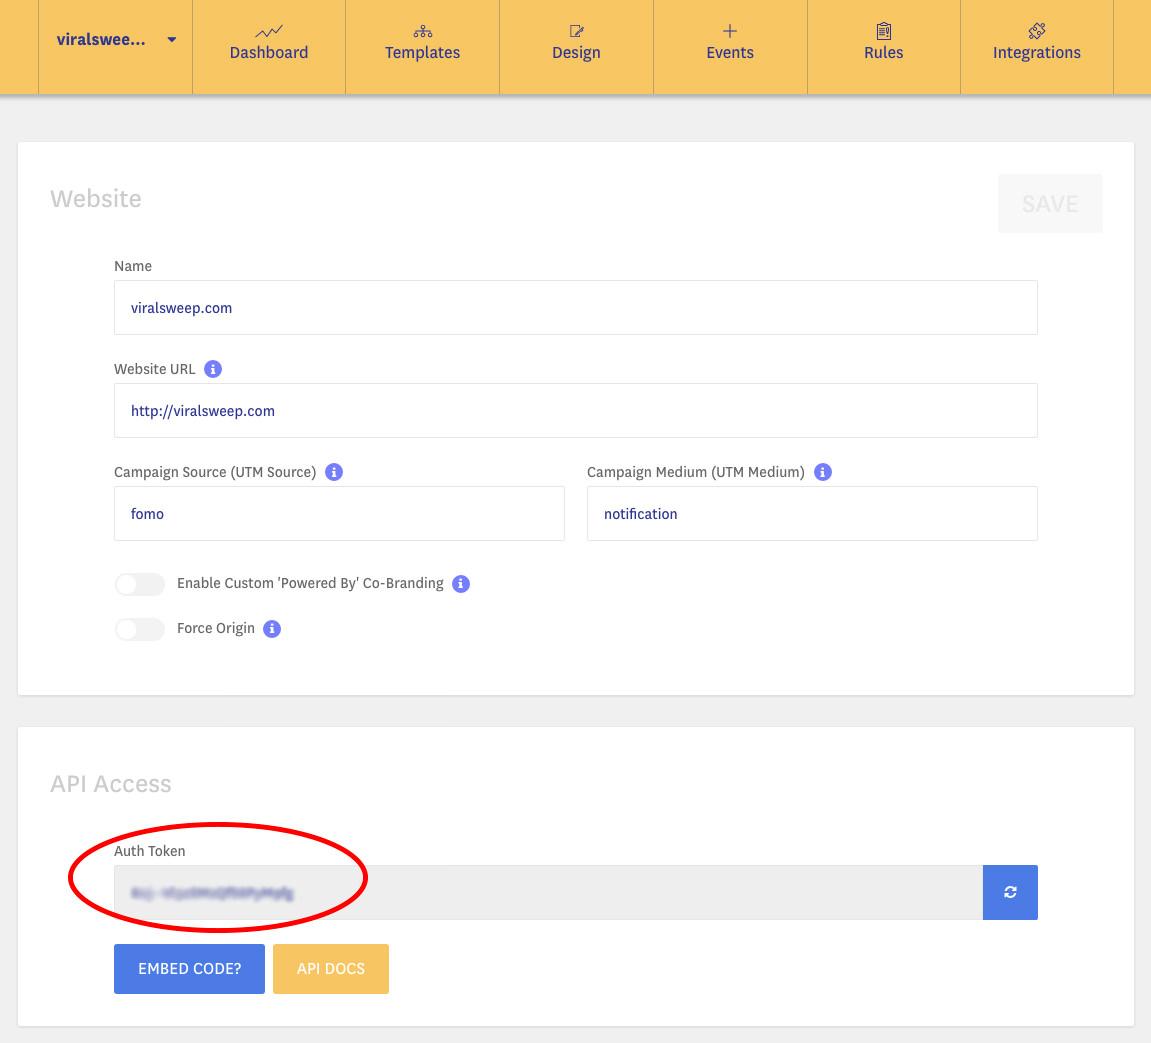 Fomo - ViralSweep Knowledge Base